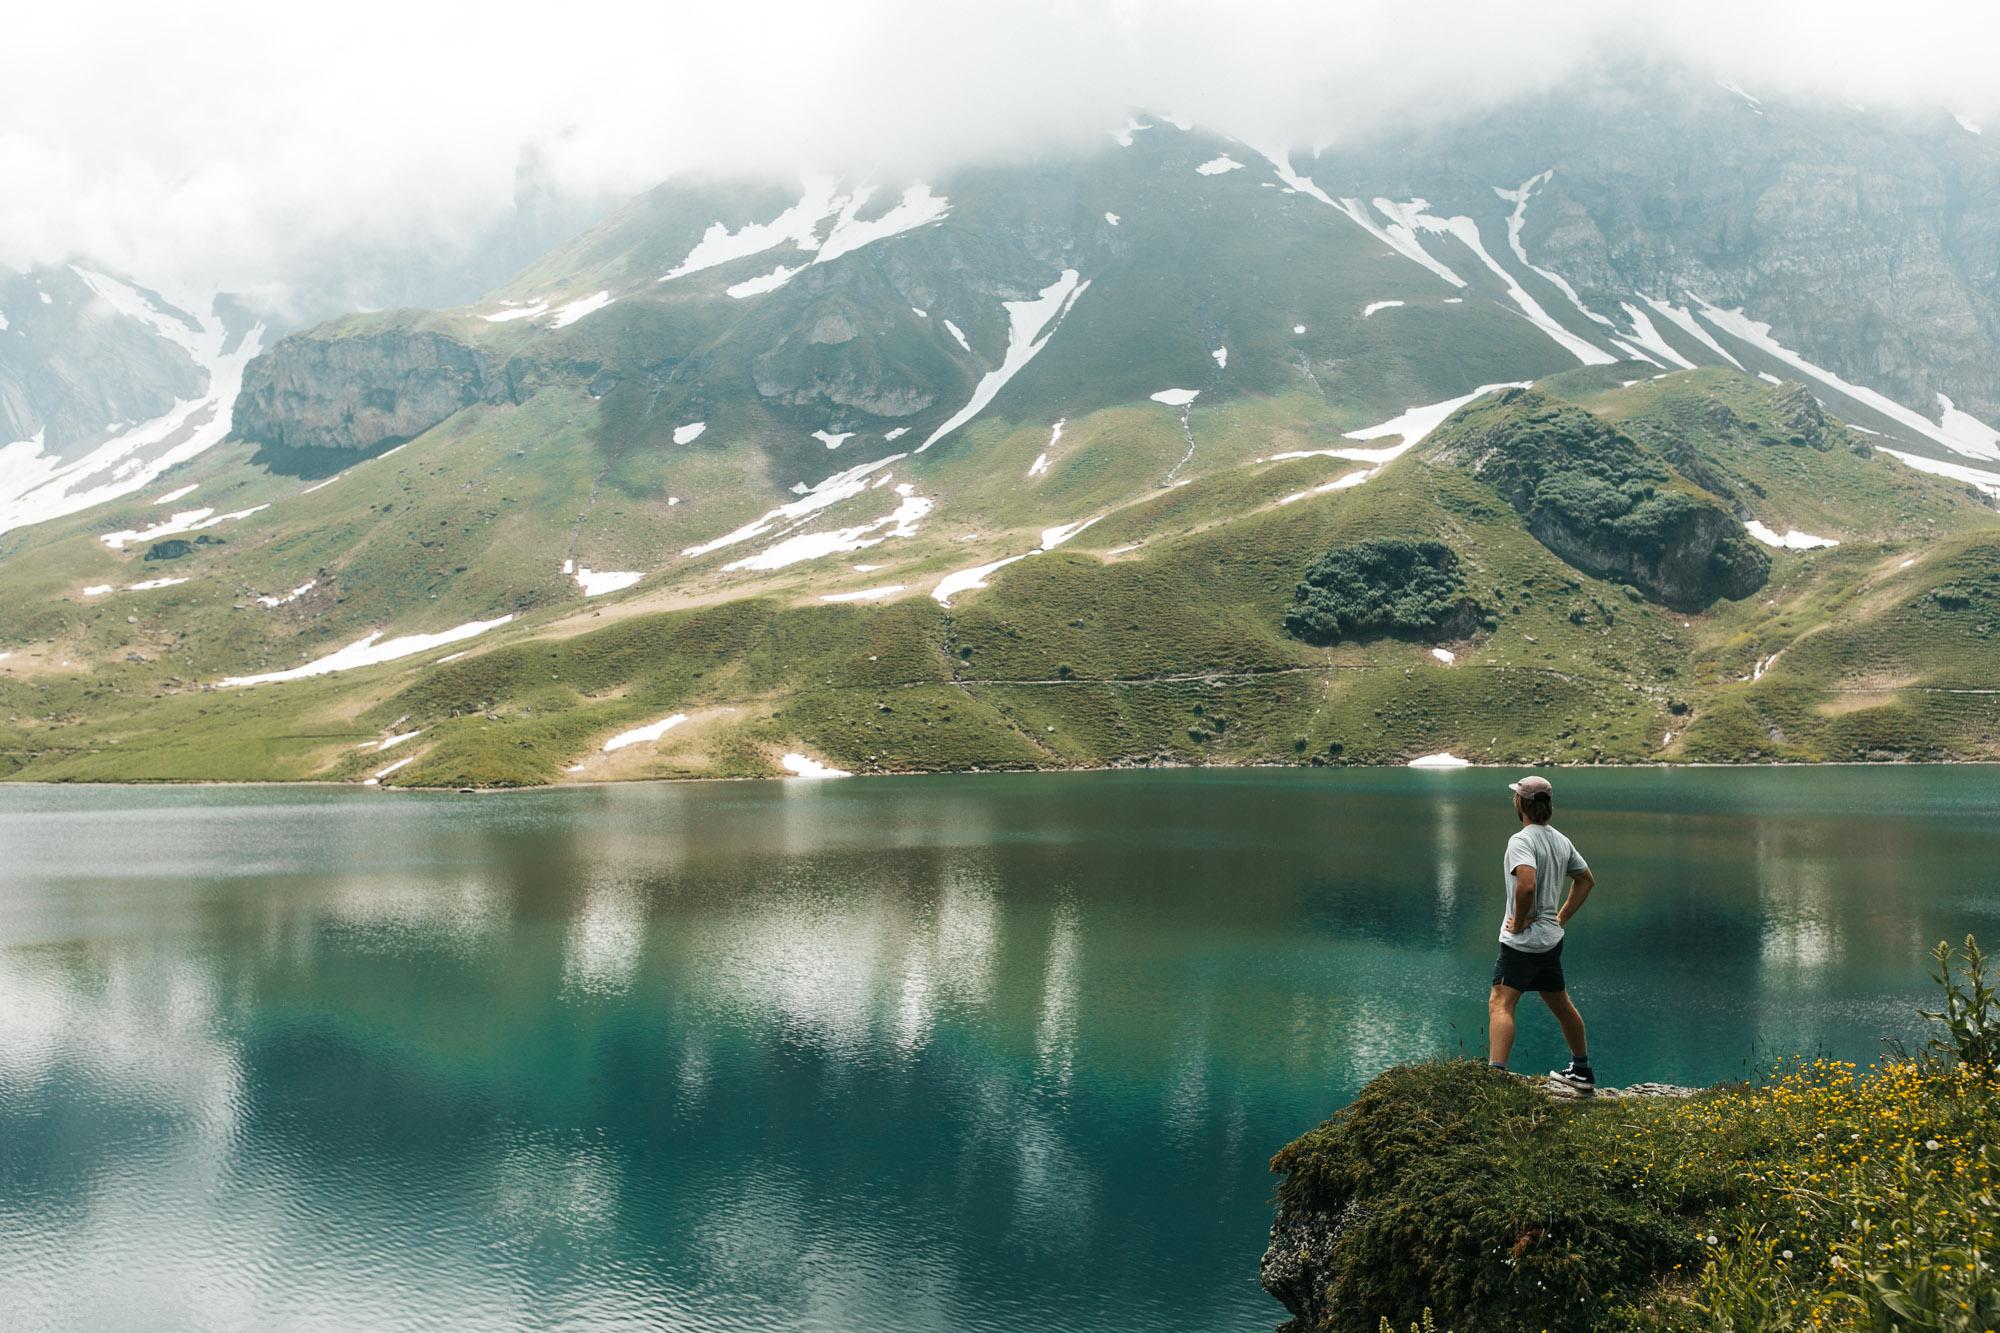 SwitzerlandBlog_HBGOODIE2018 (32 of 58).jpg